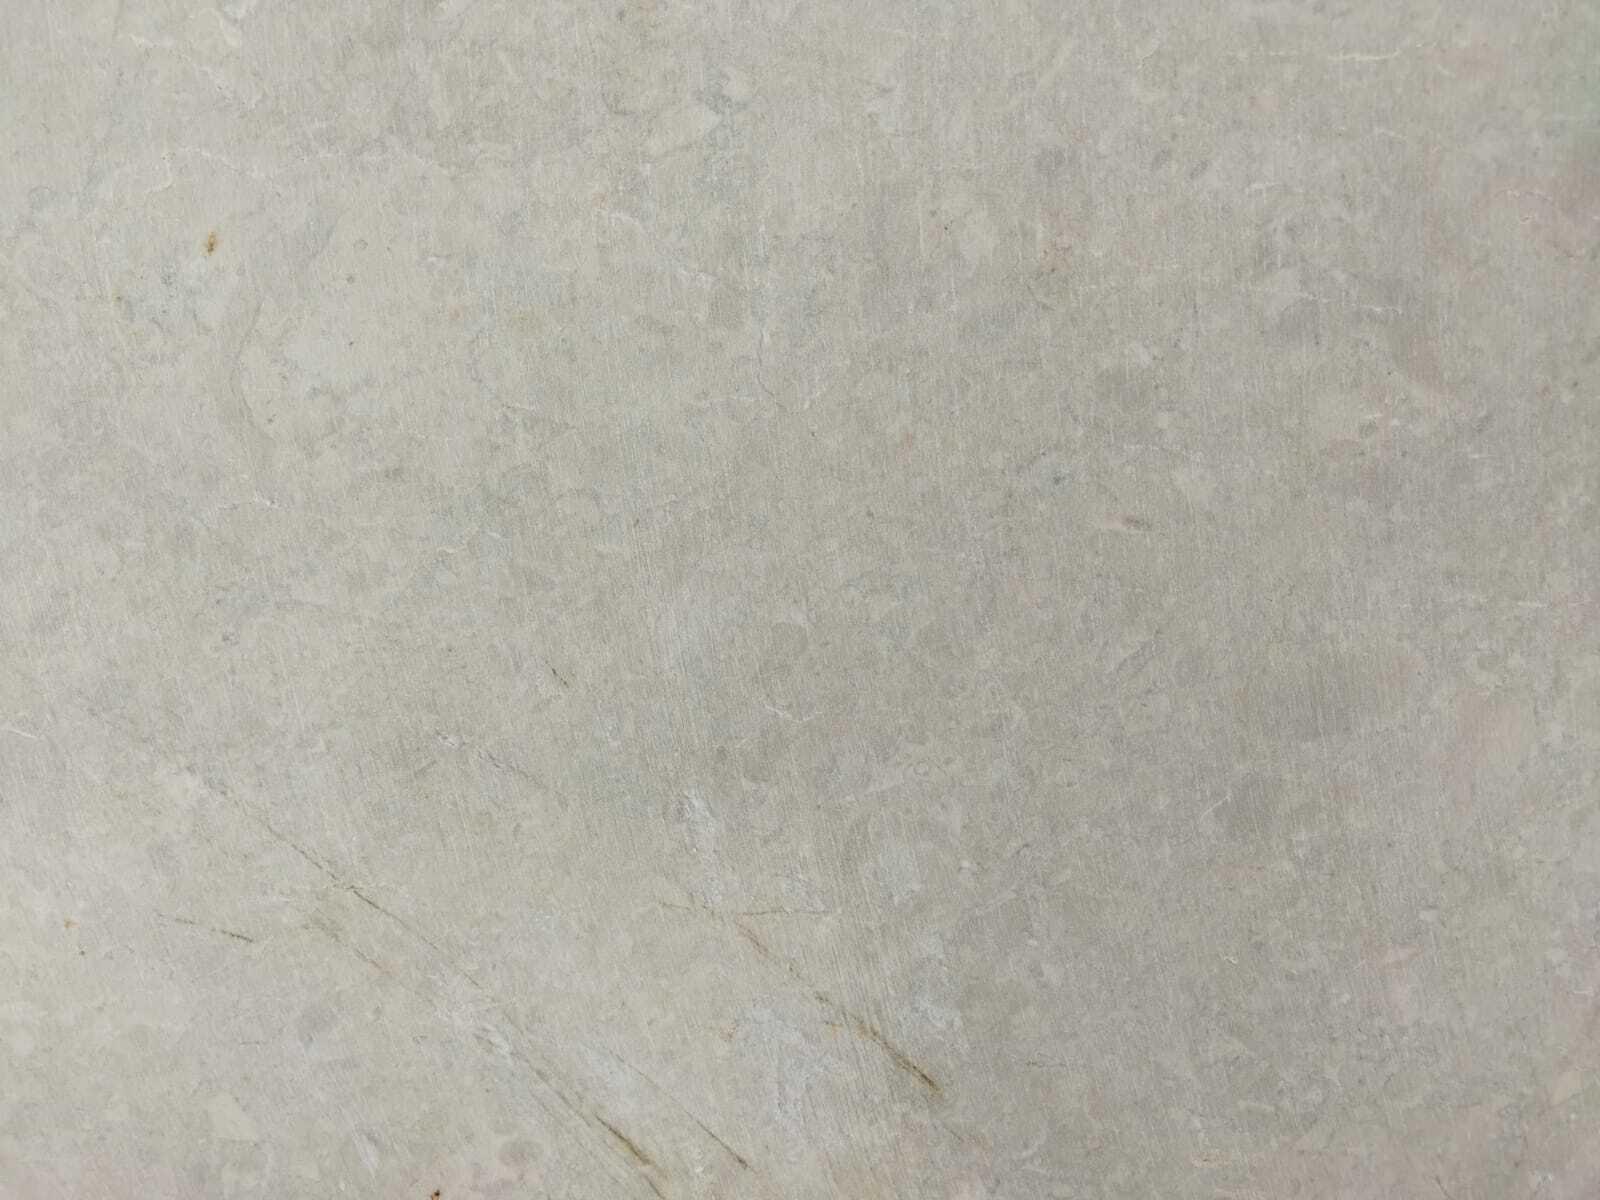 ottoman beige marble blocks